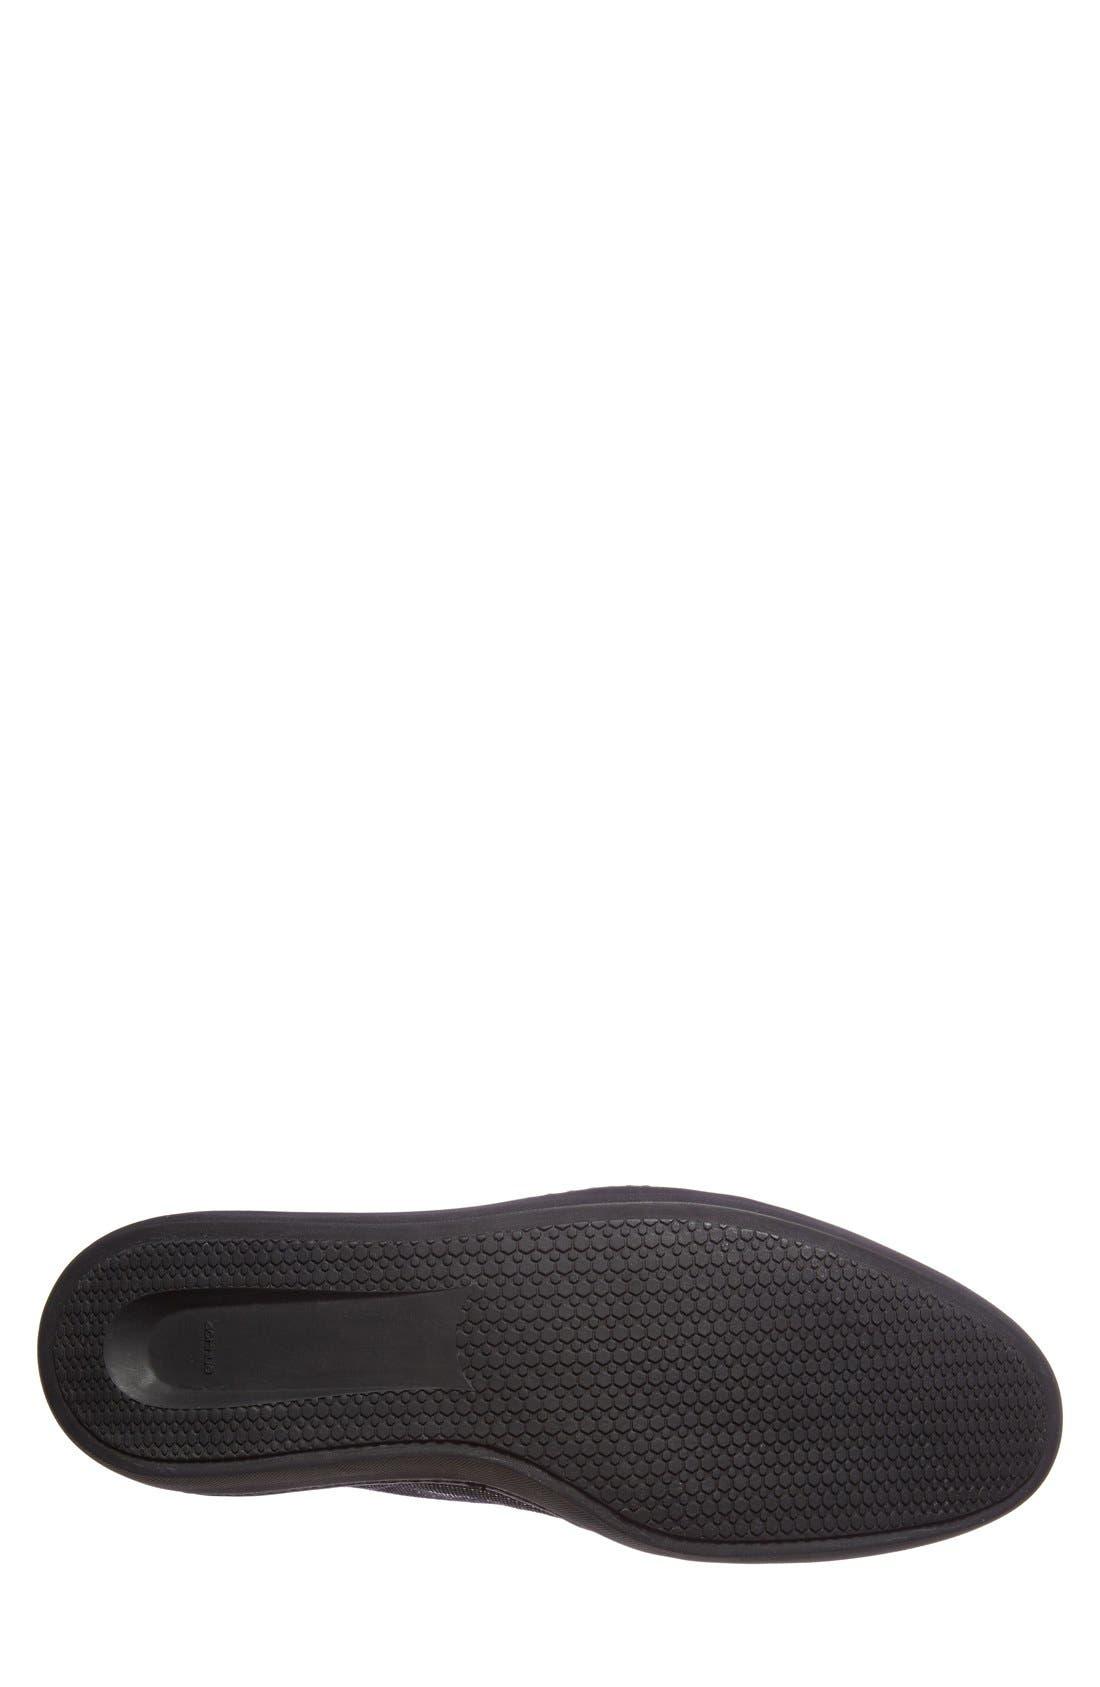 'Bordeau' Sneaker,                             Alternate thumbnail 4, color,                             001